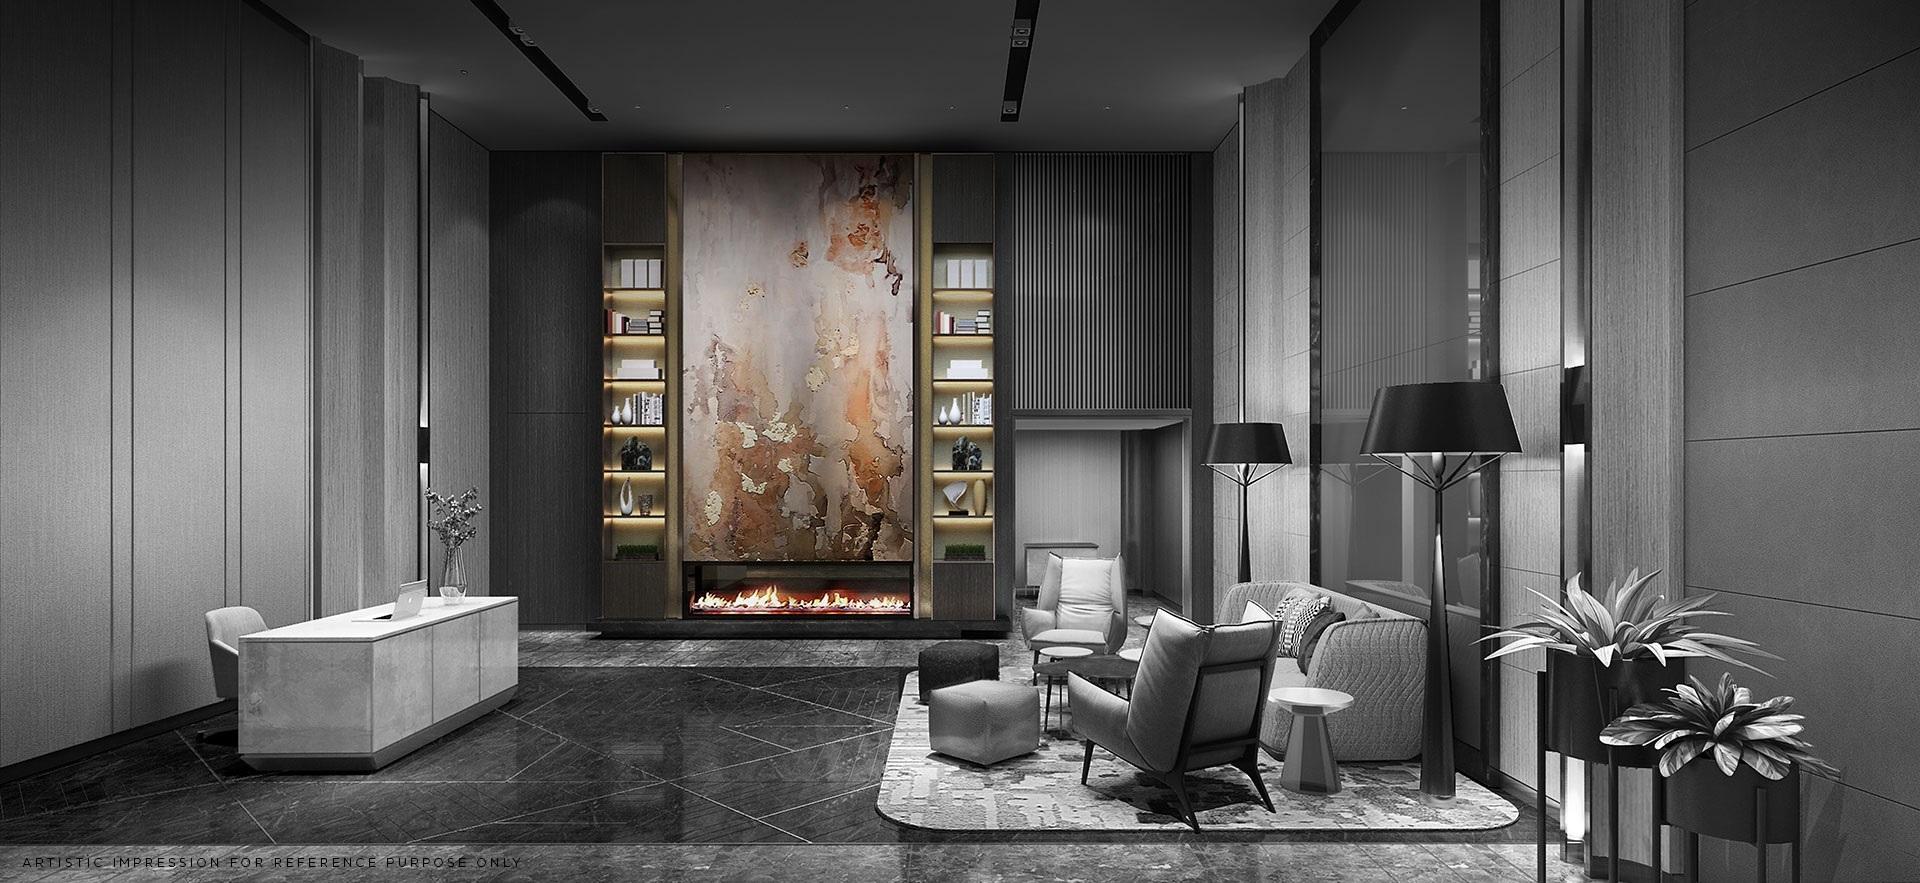 radius one mahalaxmi phase 2 project apartment interiors1